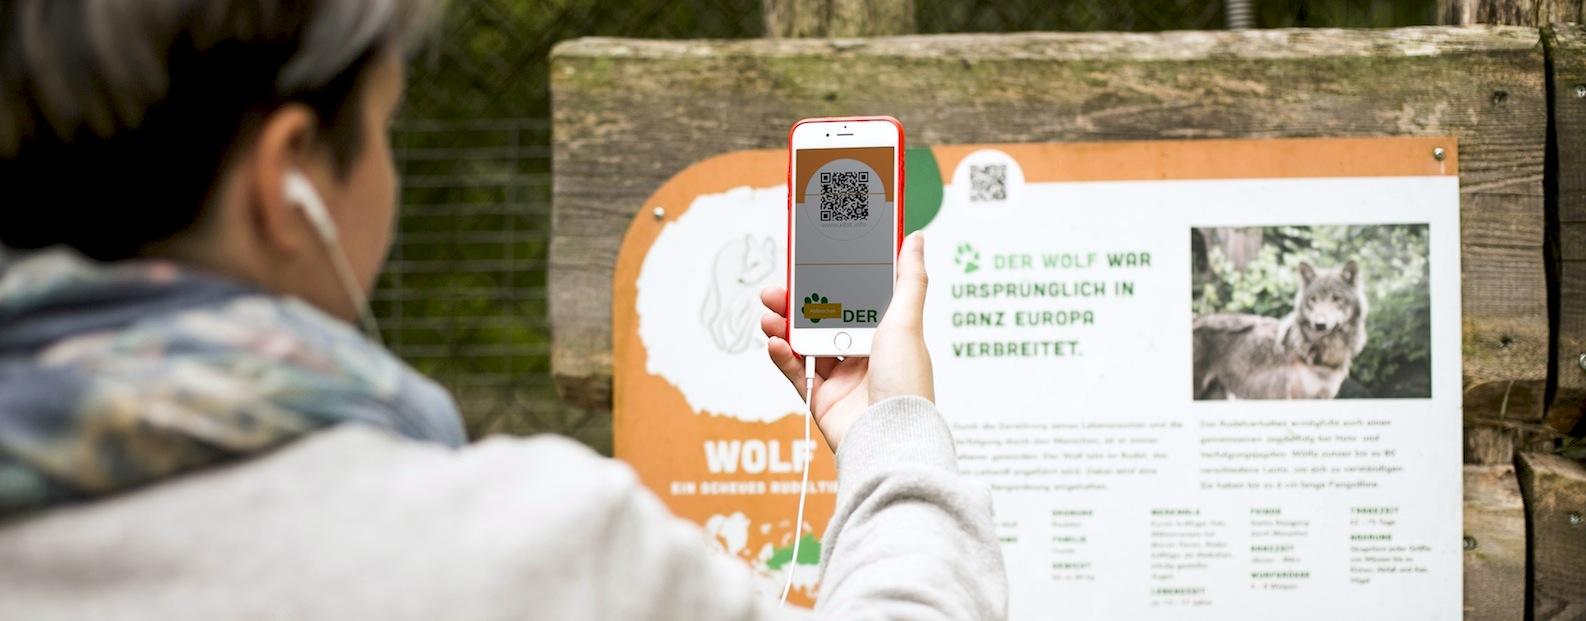 Image of Scanning a QR-code